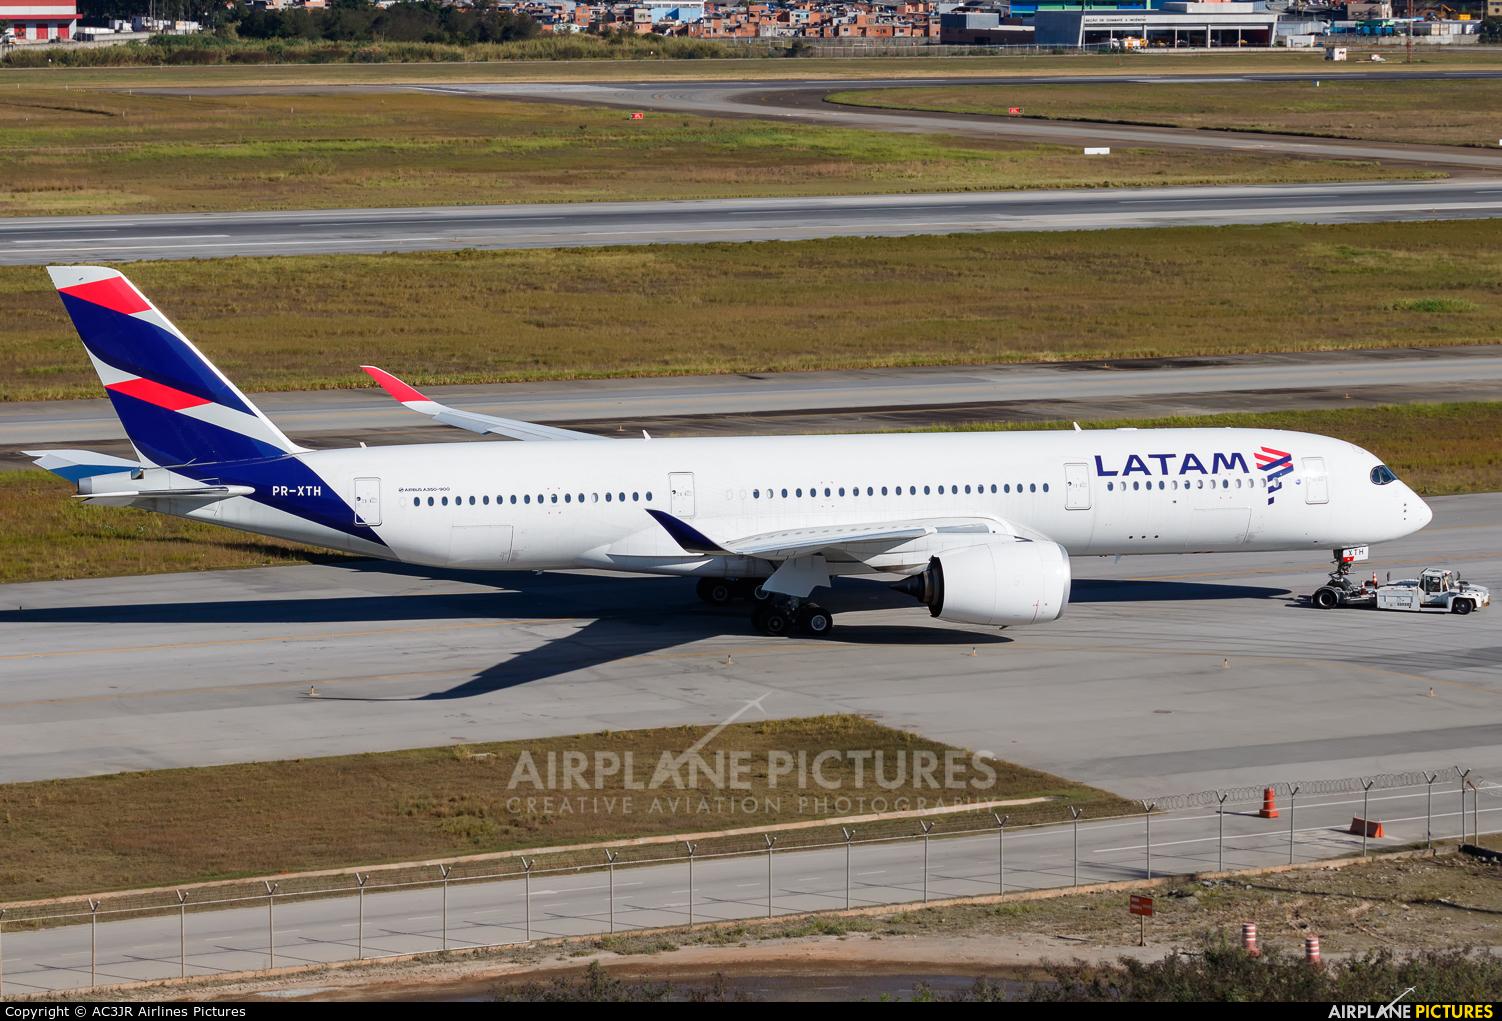 LATAM PR-XTH aircraft at São Paulo - Guarulhos